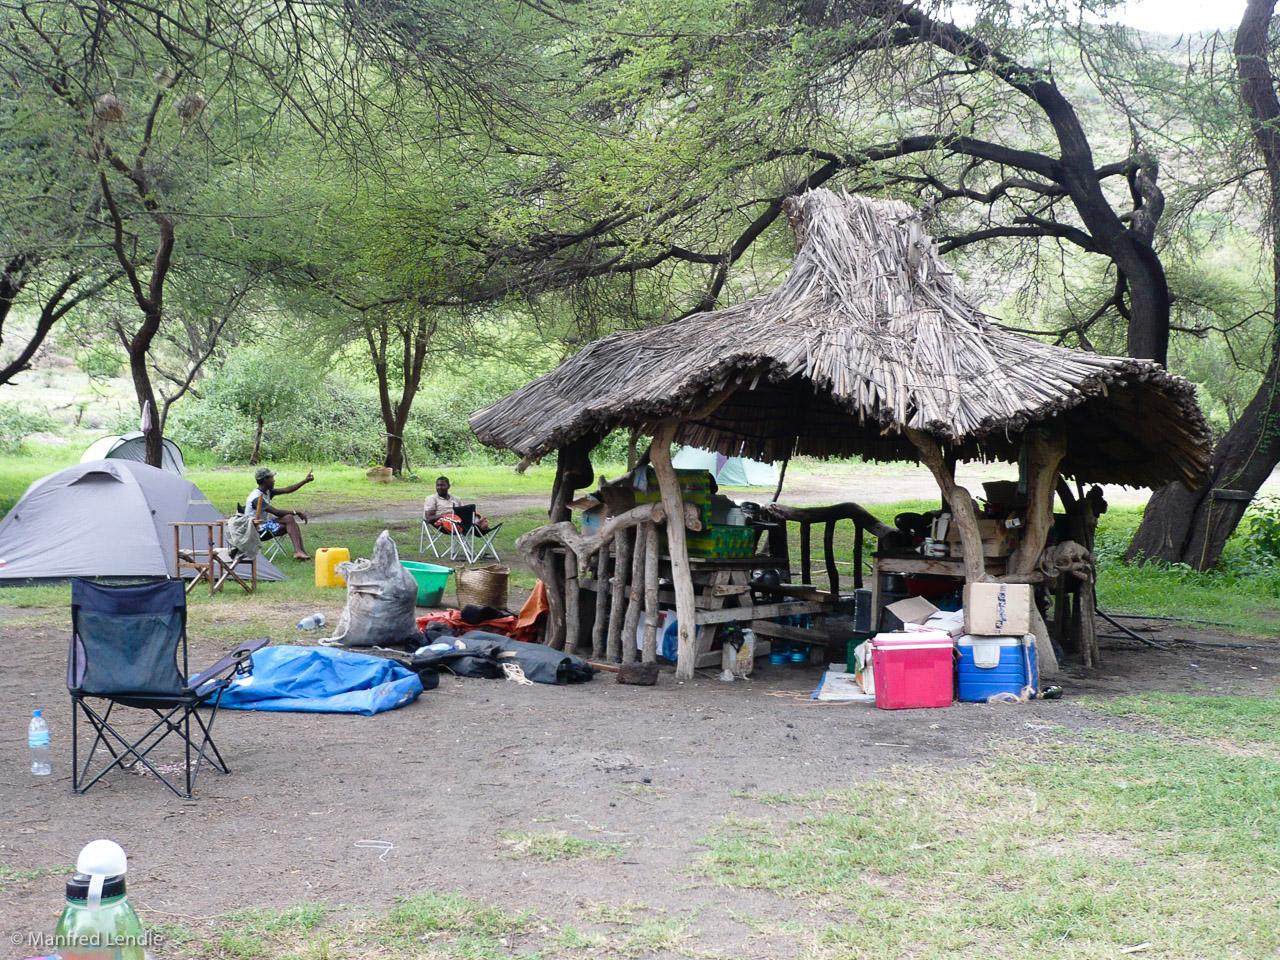 Tansania_2009-1060577.jpg